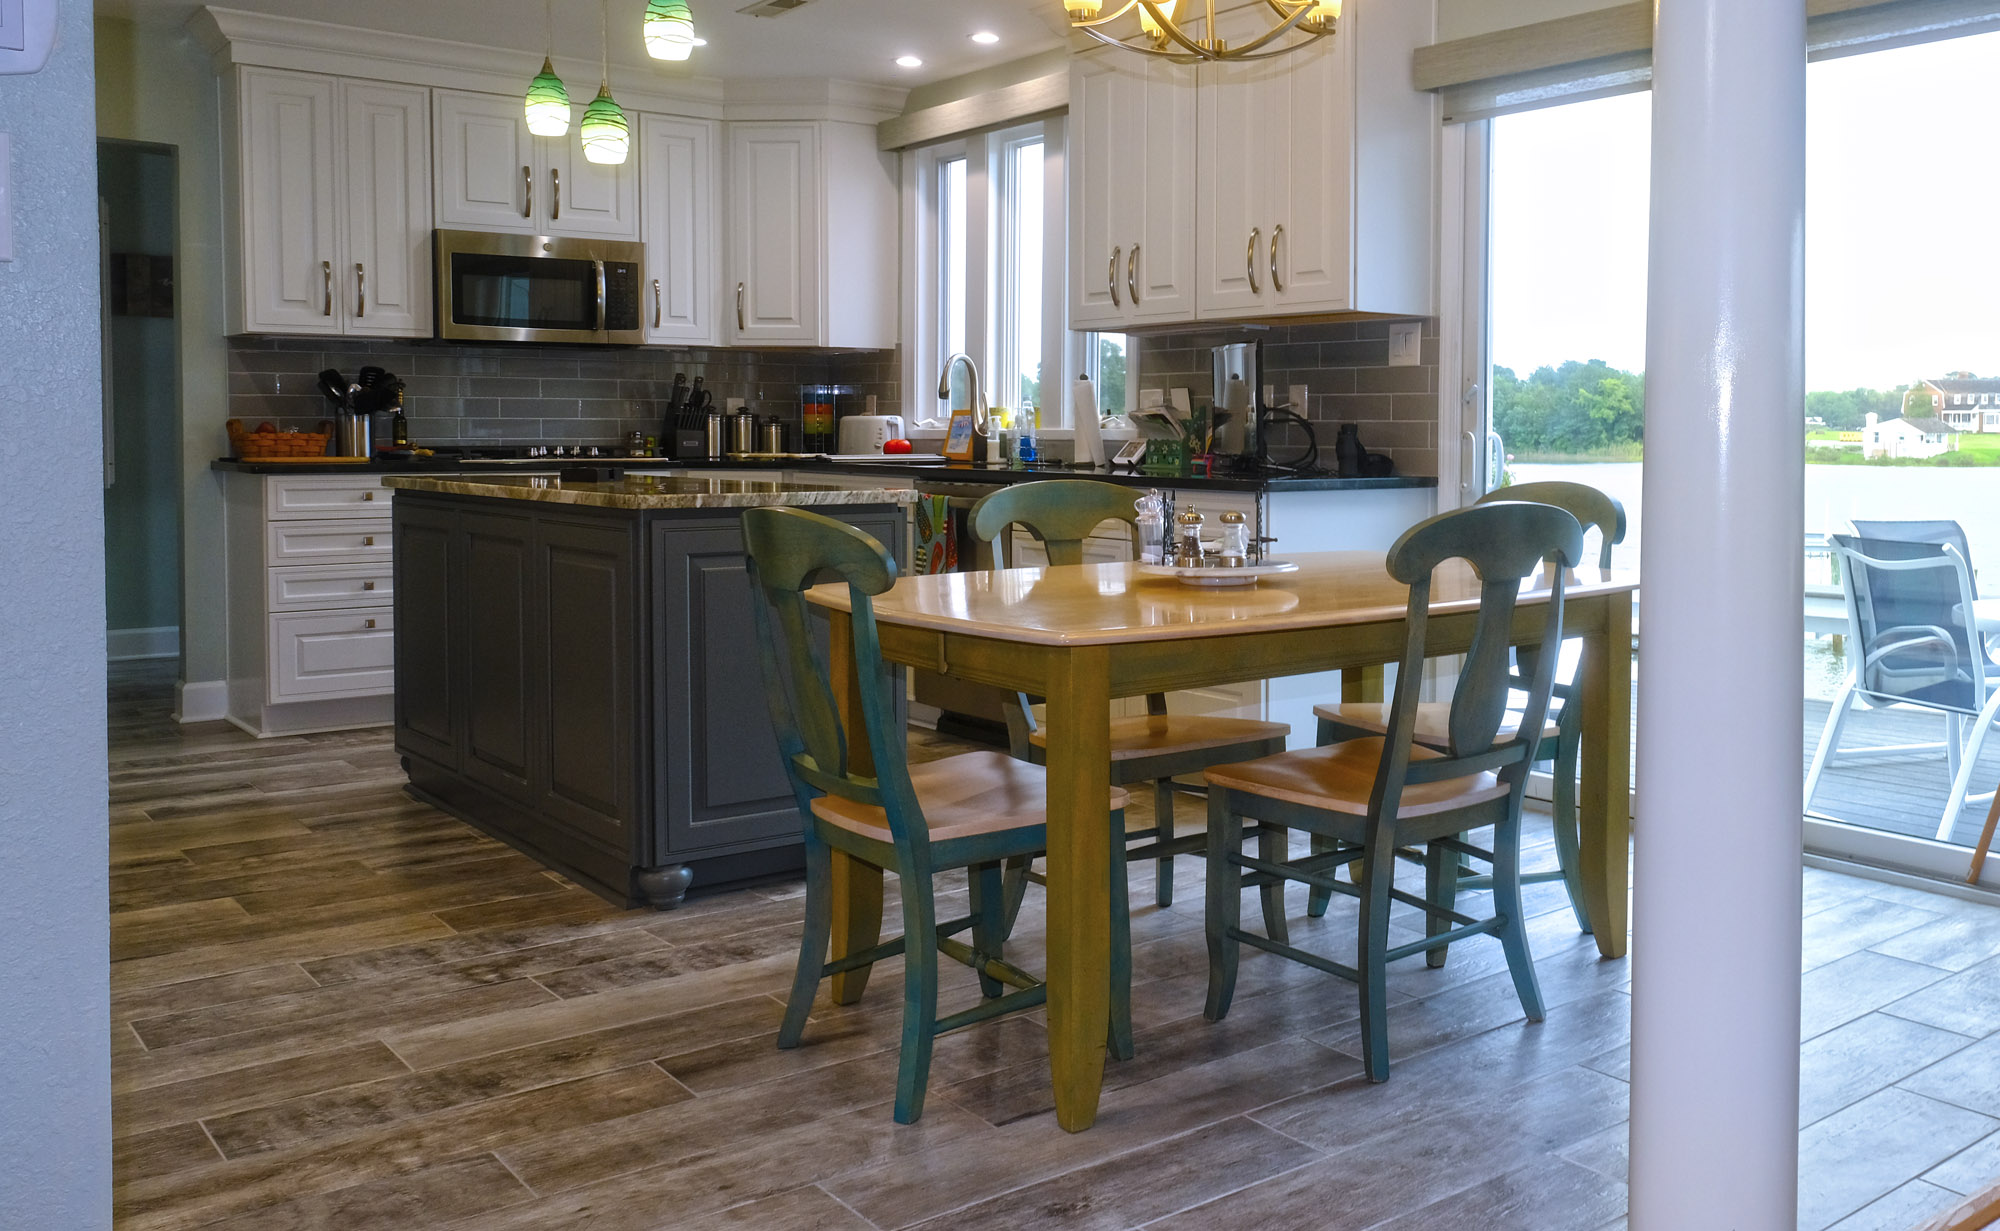 Kitchen - After photo